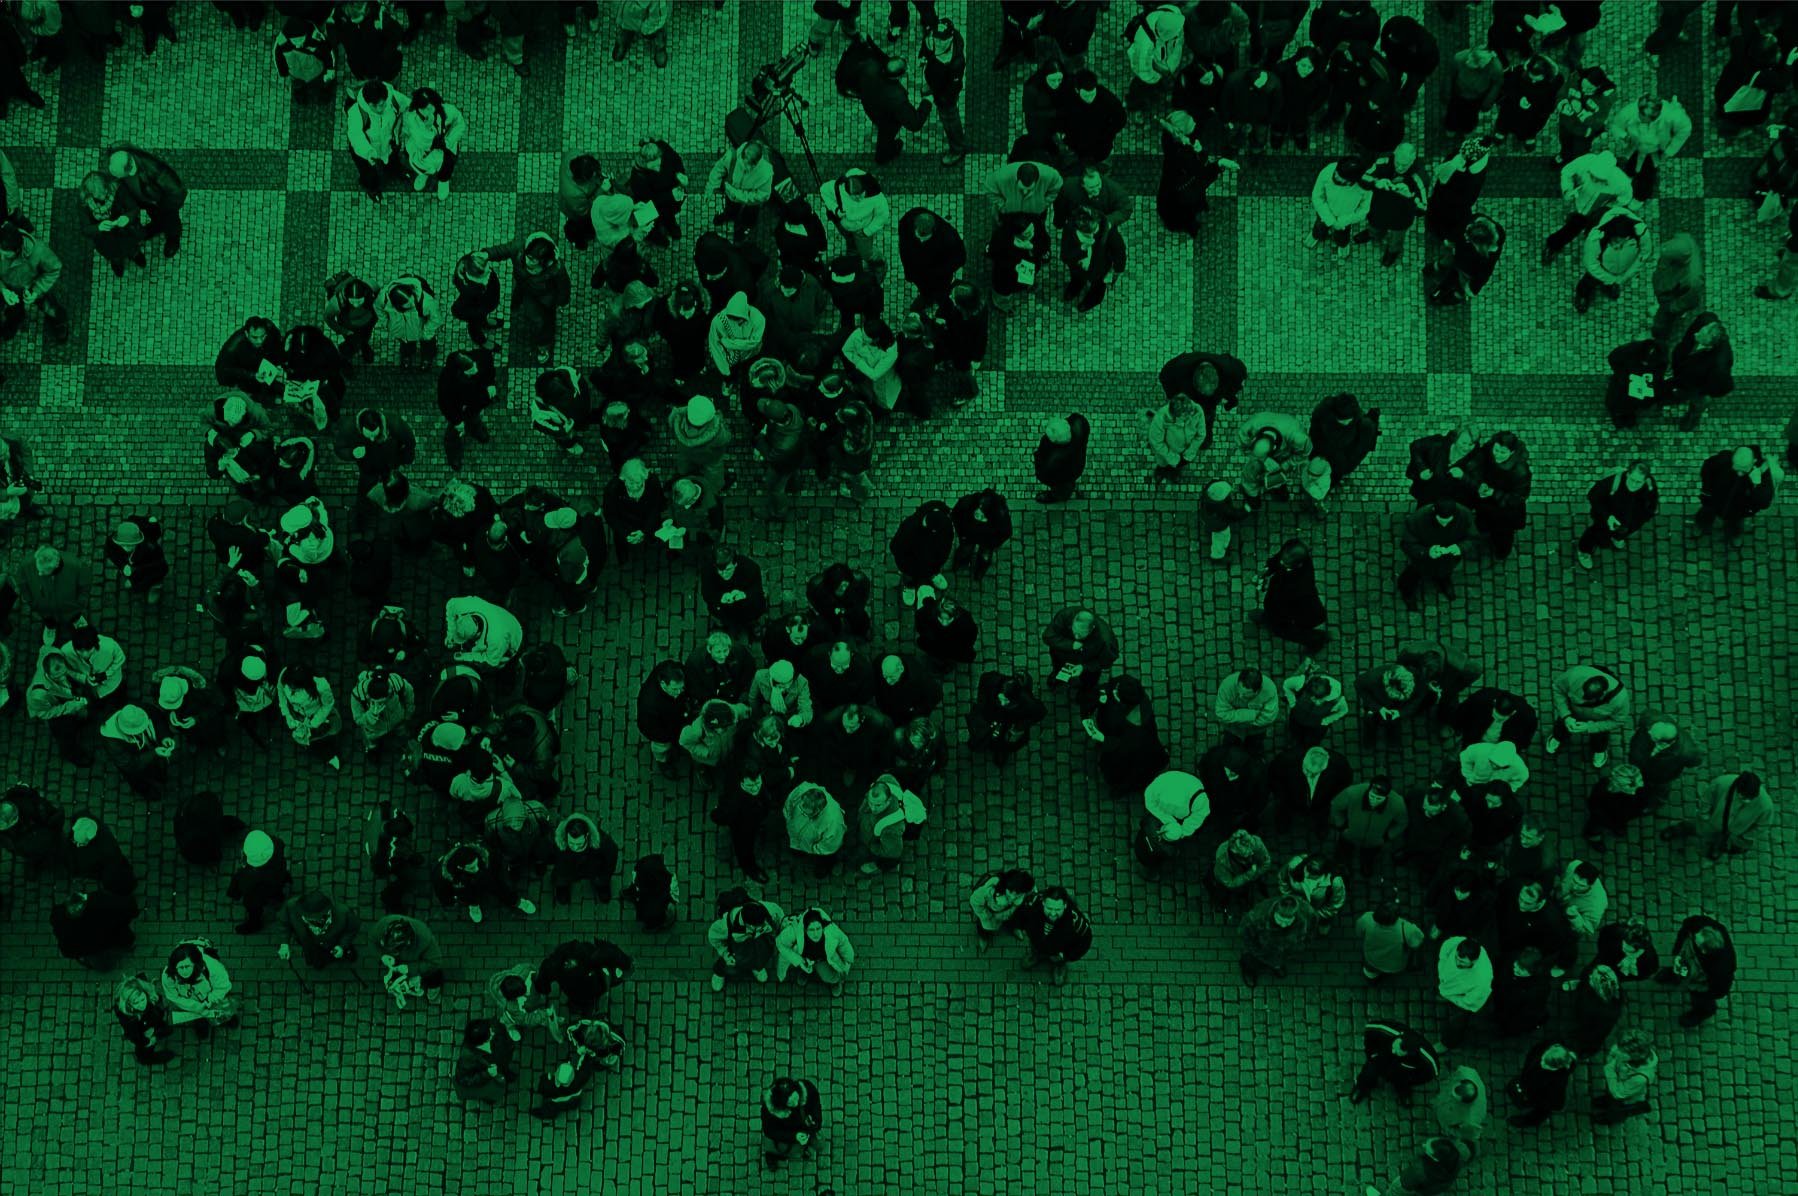 Crowd_Street_Crossing_Green.jpg